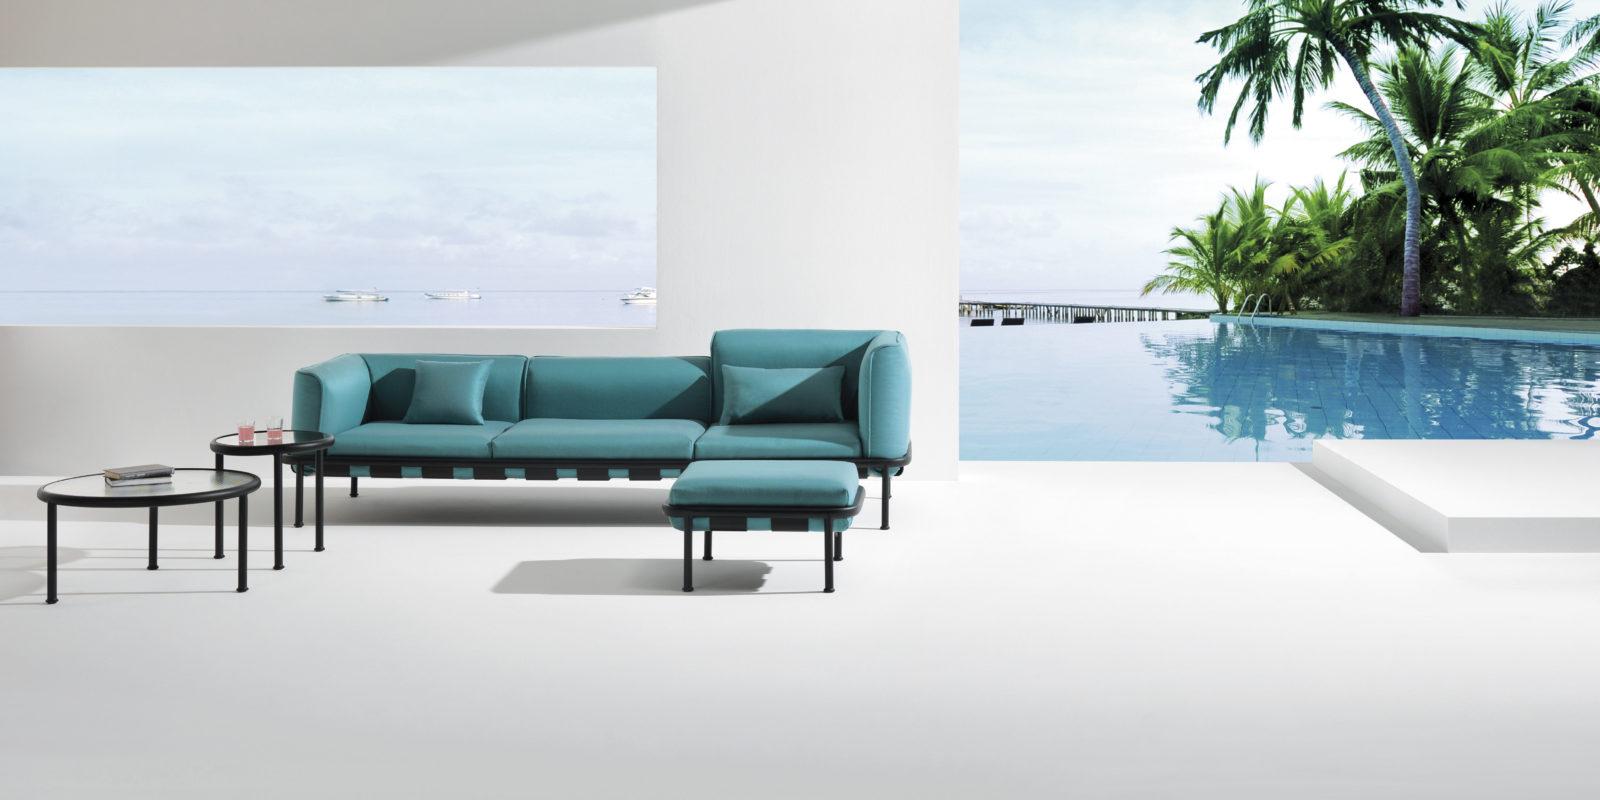 mobilier jardin emu amazing chaises directeur snooze blanc casse tissu glace emu jardinchic. Black Bedroom Furniture Sets. Home Design Ideas